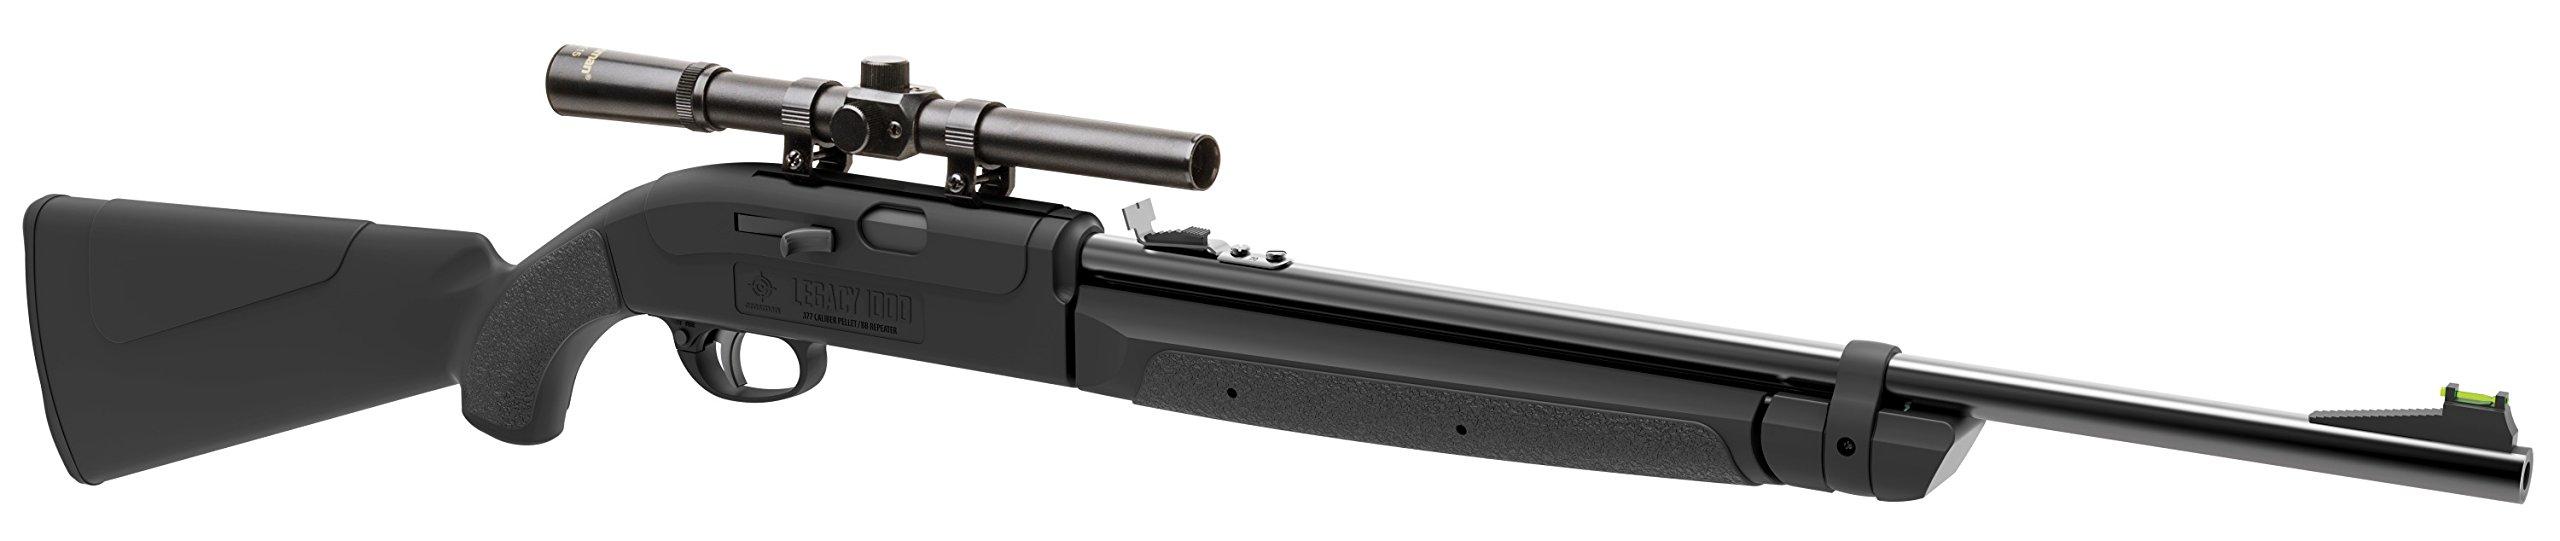 Crosman Legacy 1000 Single Shot, Variable Pump Air Rifle CLGY1000KT by Crosman